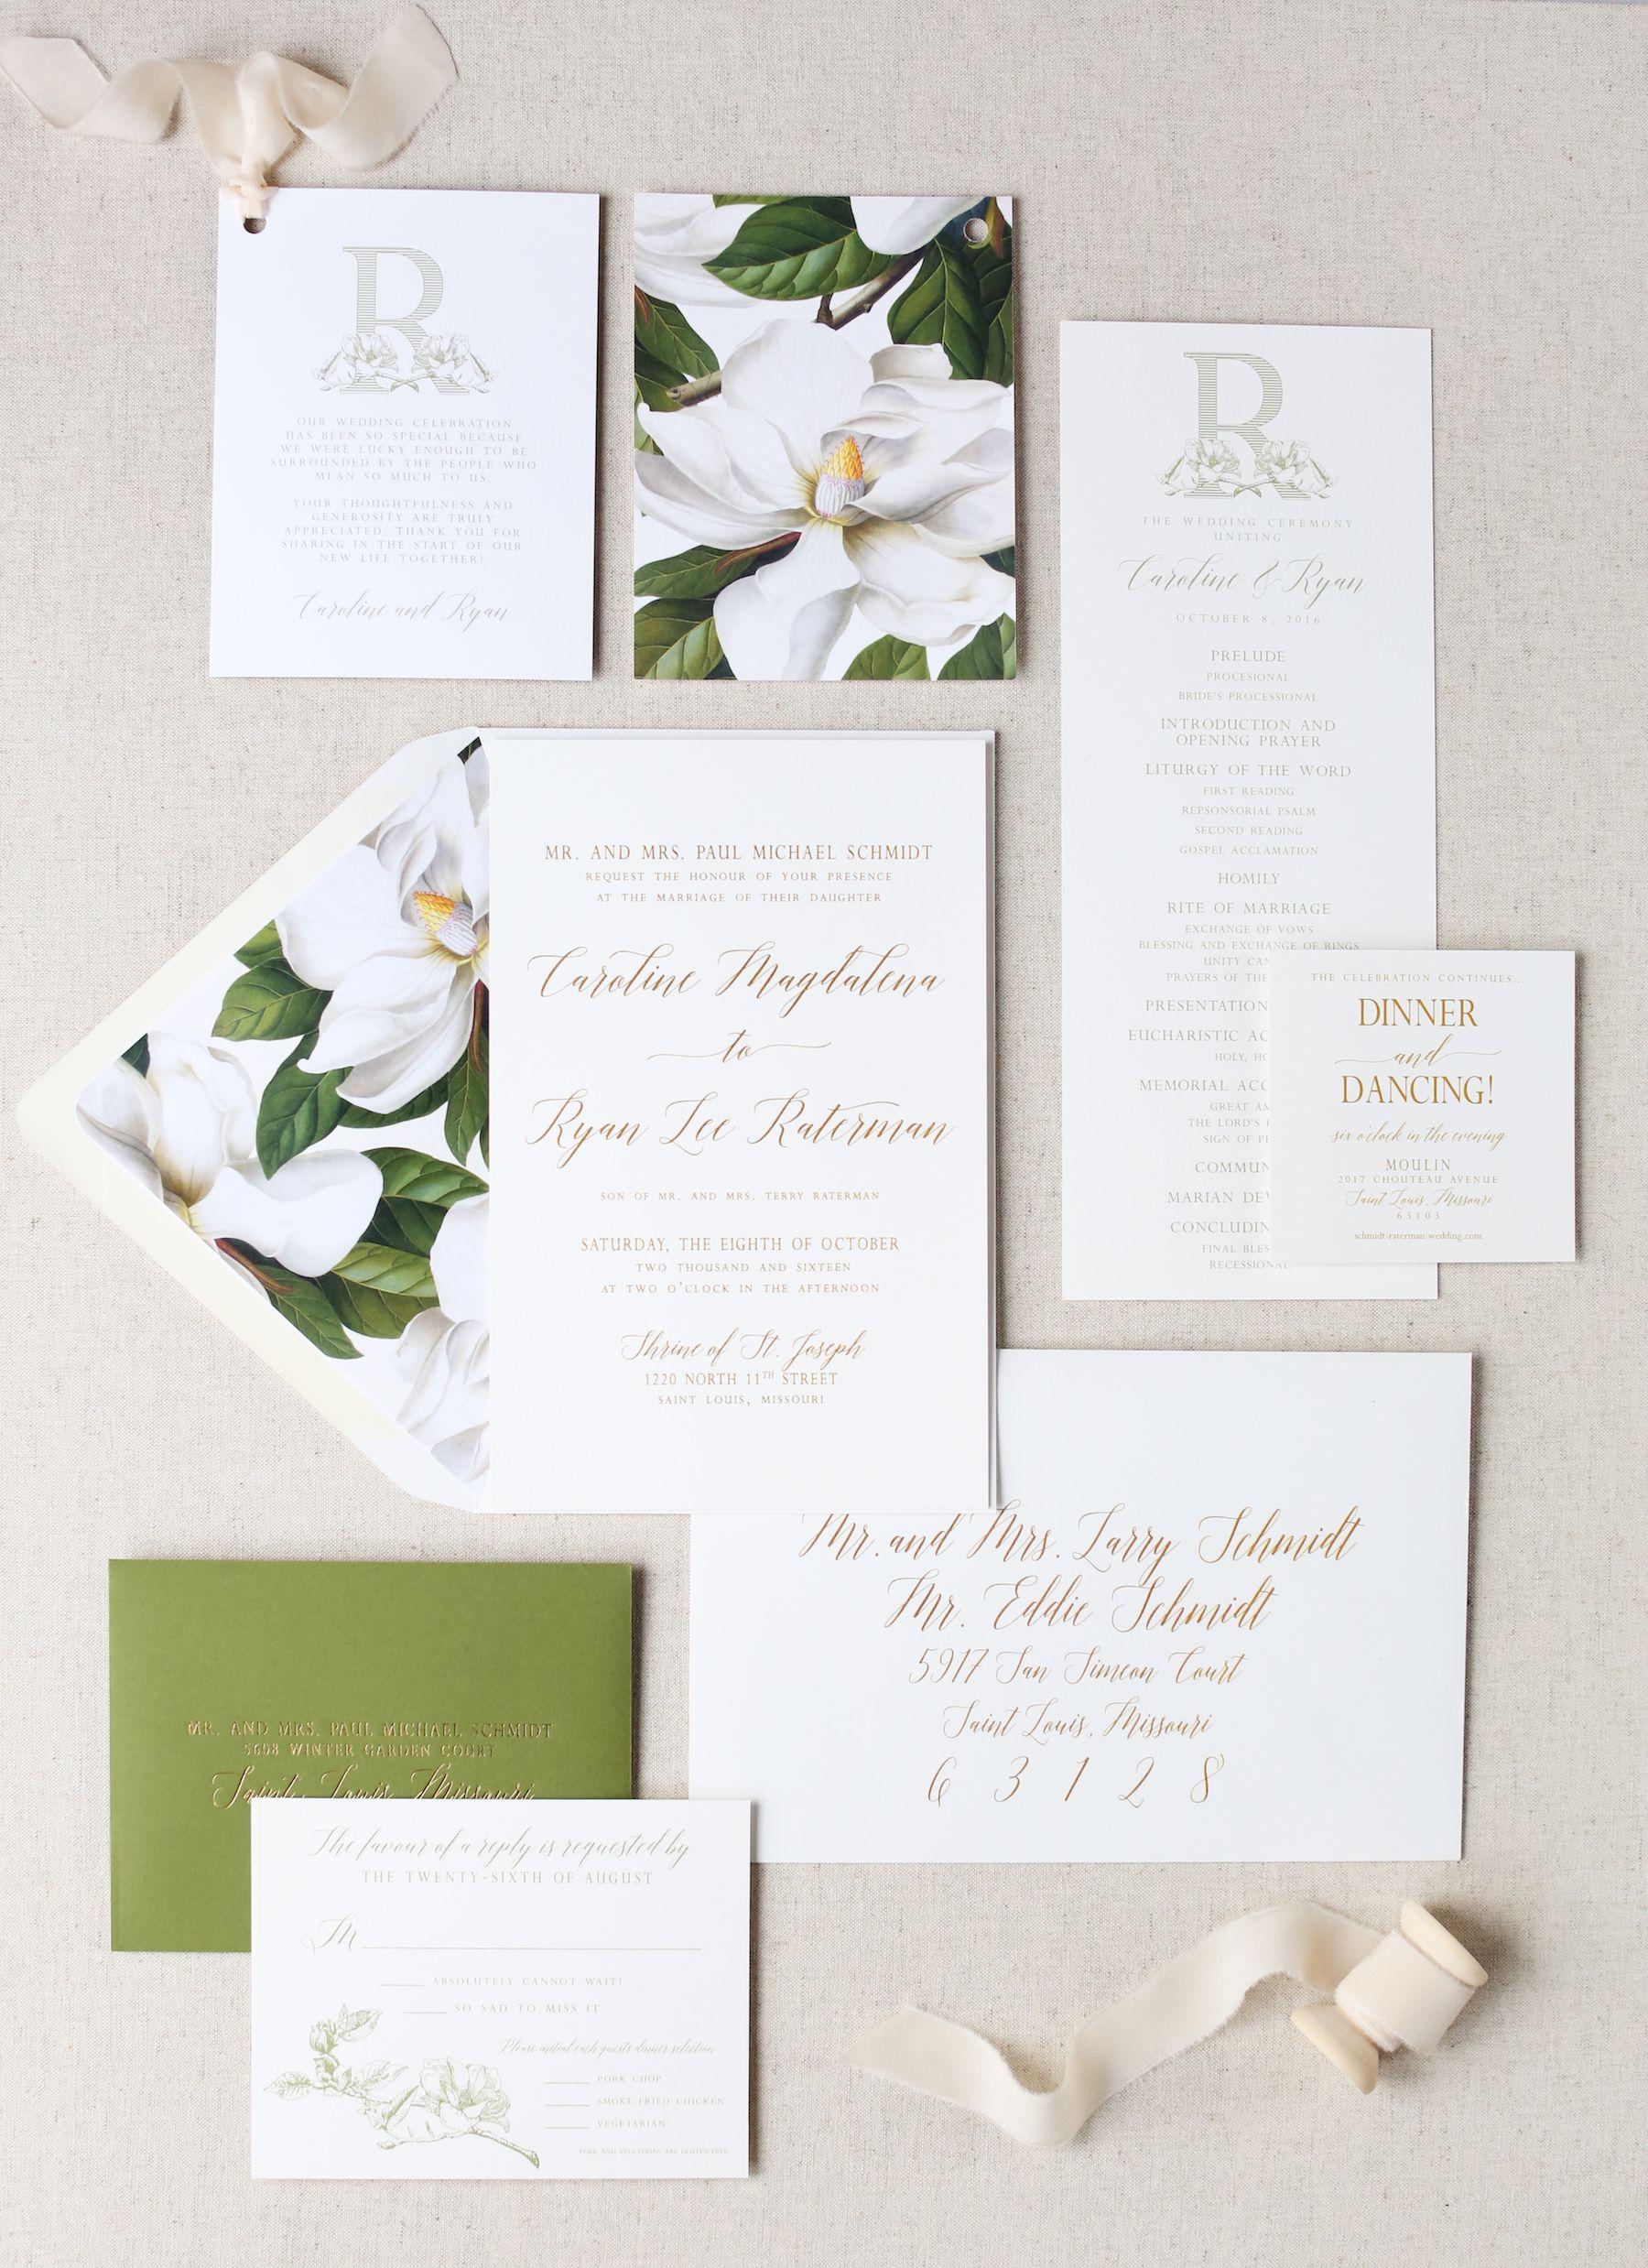 Magnolia Wedding Invitation Wedding Monogram Magnolia Monogram Magnolia E Magnolia Wedding Invitations Wedding Invitations Stationery Wedding Invitations